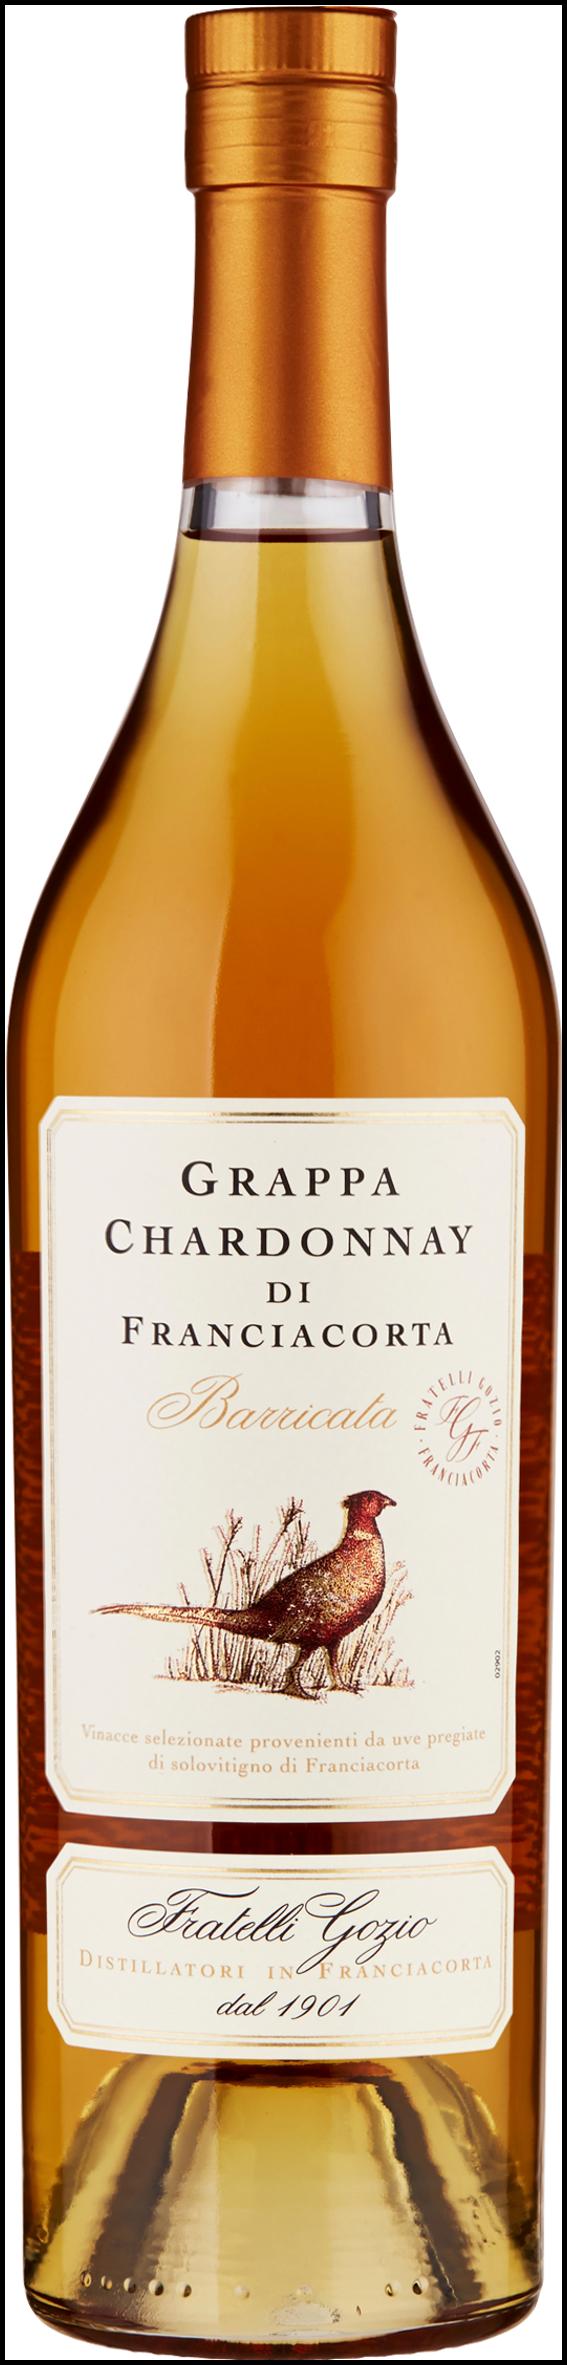 GRAPPA BARRIC FRANCIACOR 50CL CHARDONNAY